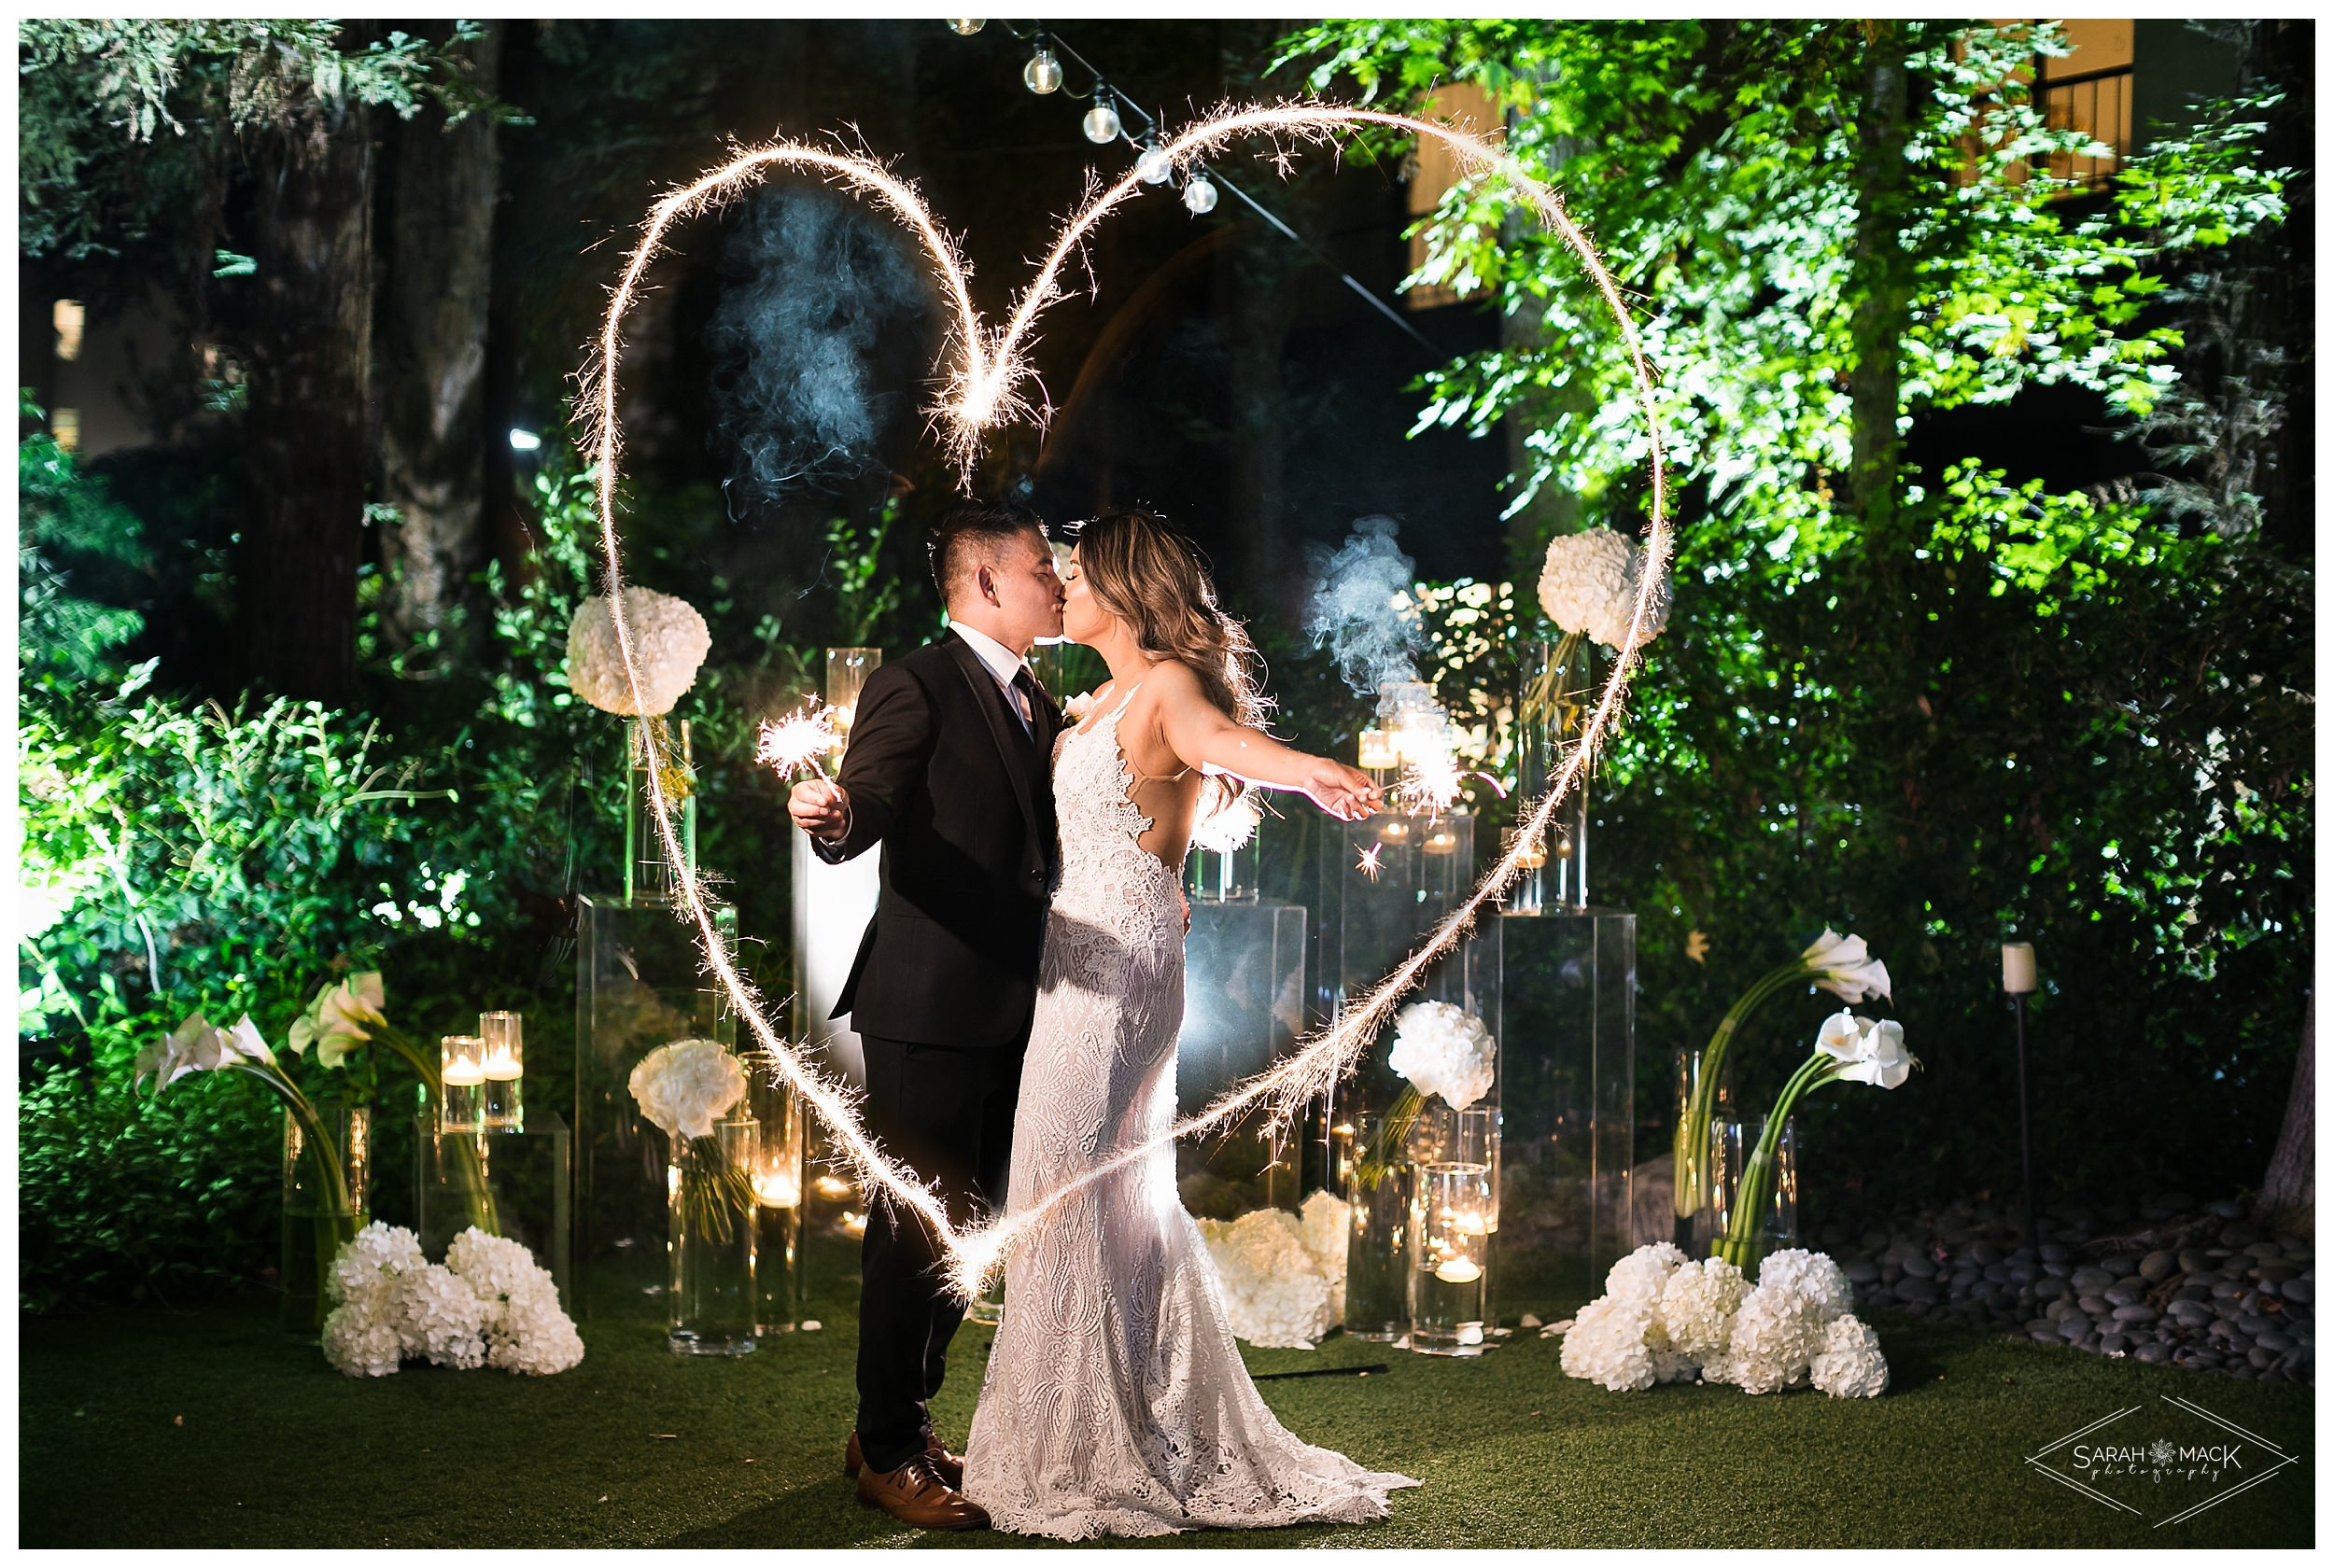 LE-Avenue-of-the-Arts-Costa-Mesa-Wedding-Photography-0204.jpg